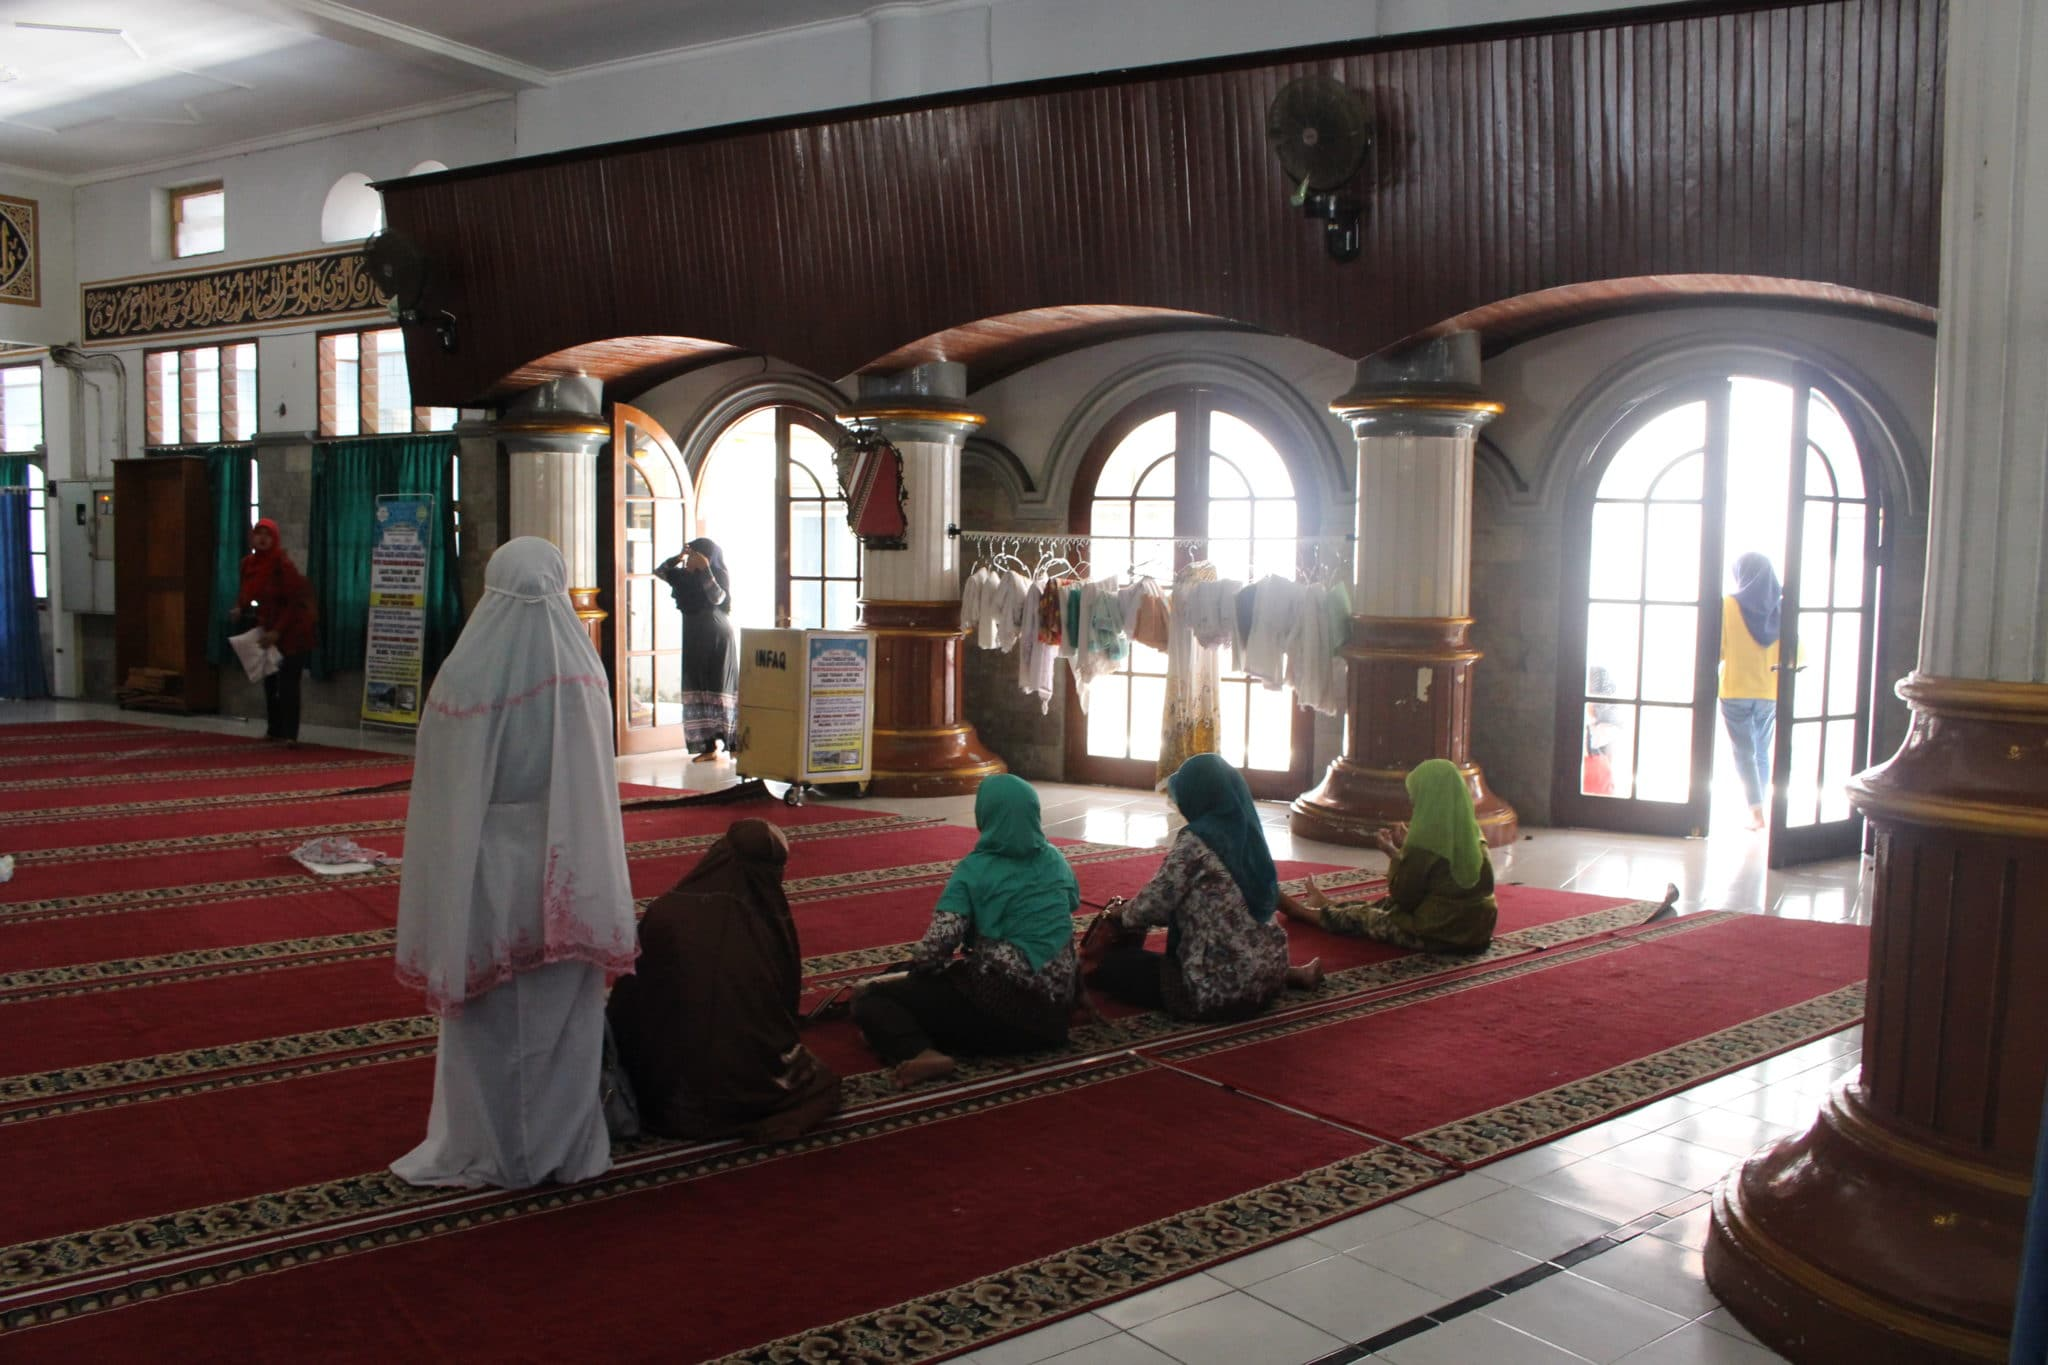 Zona exclusiva a mulheres, na mesquita de Pukowerto.